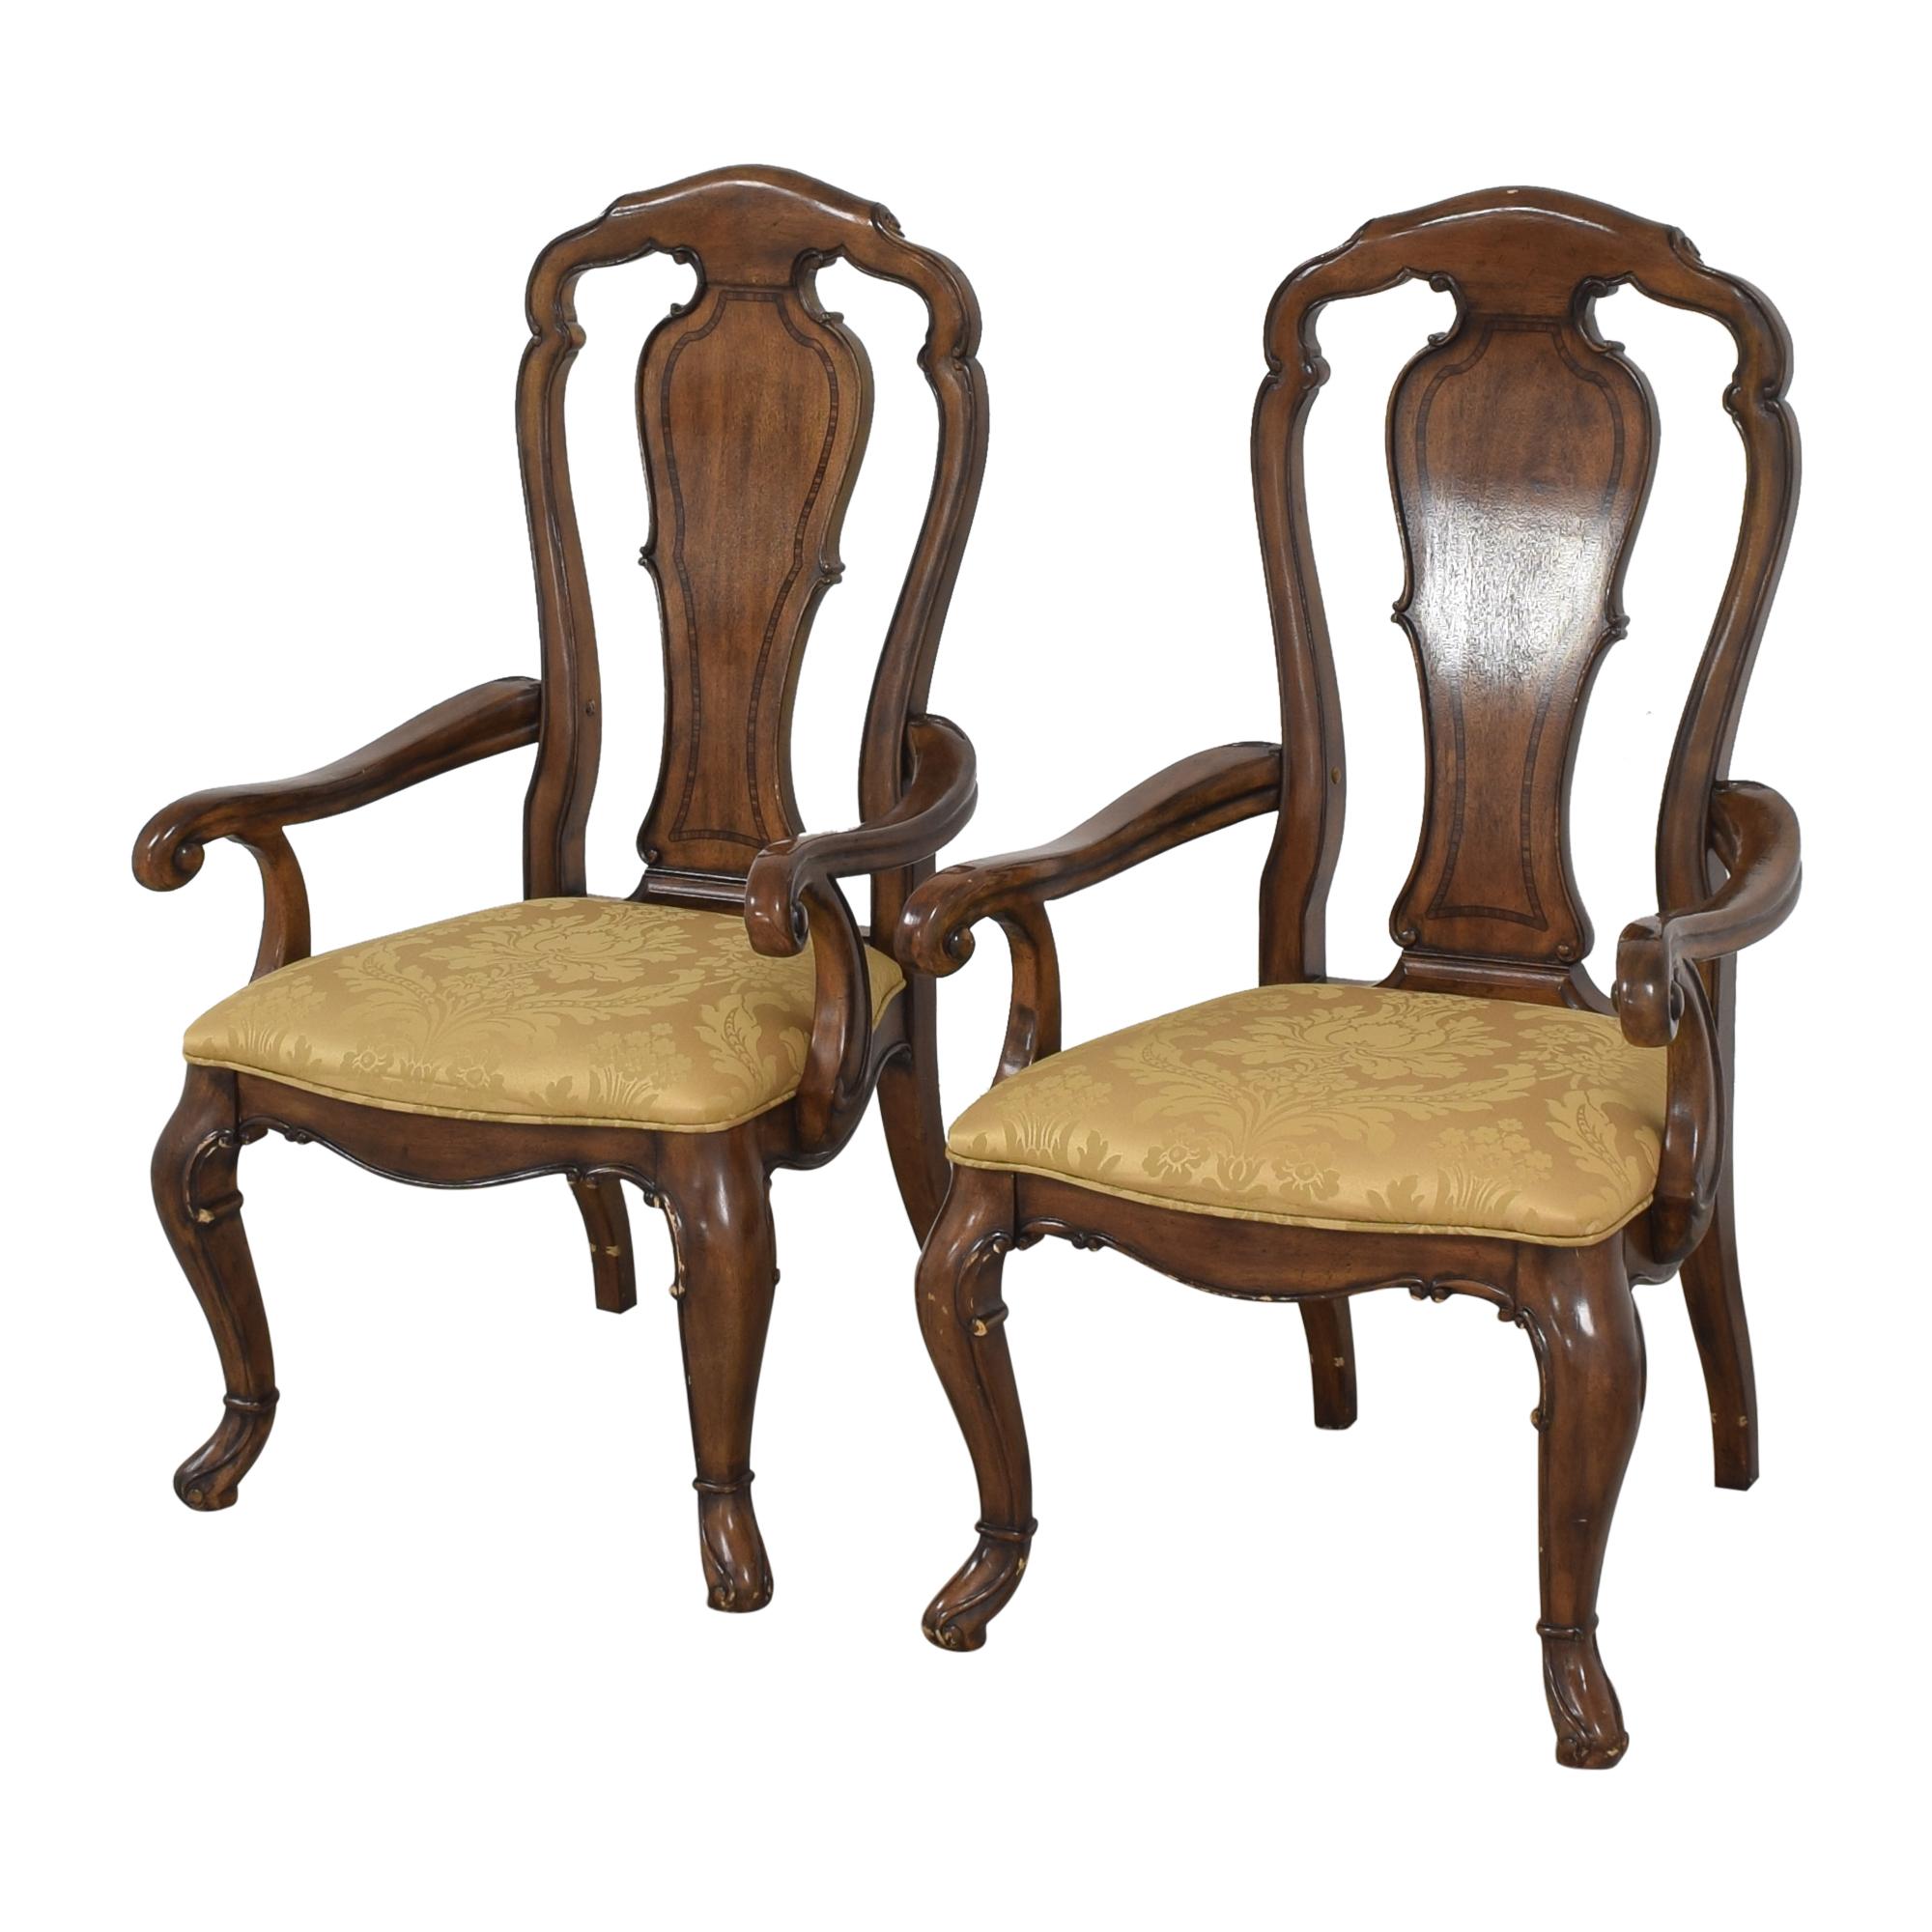 buy Thomasville Ernest Hemingway Granada Dining Arm Chairs Thomasville Dining Chairs